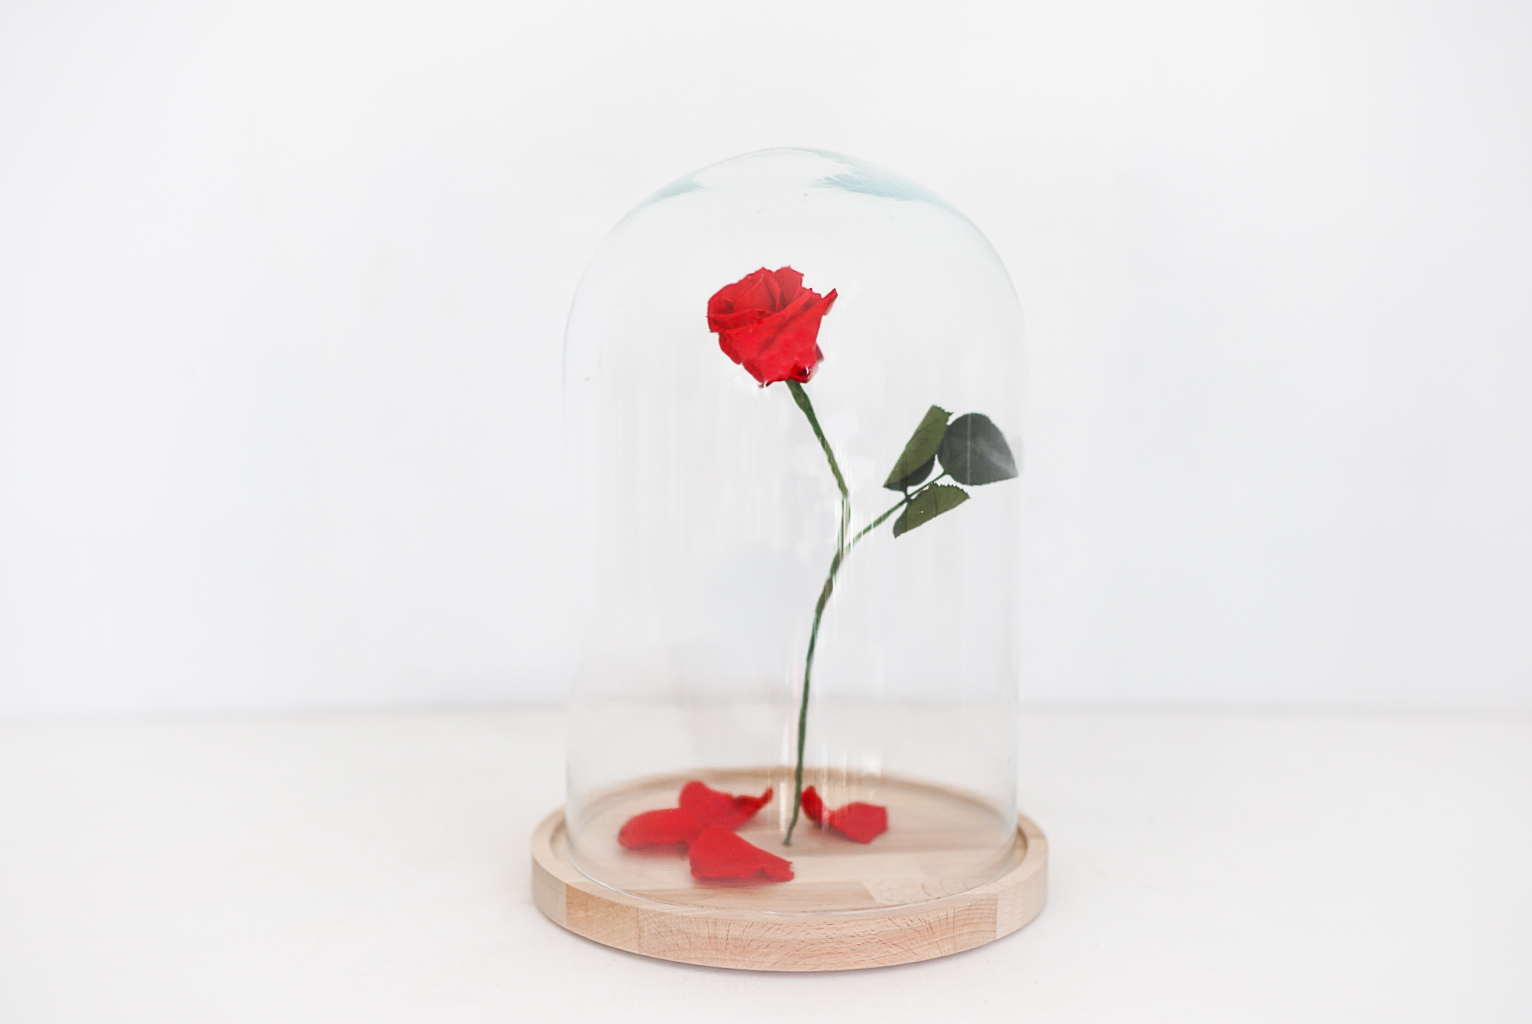 campana-bella-y-bestia-rosa-roja